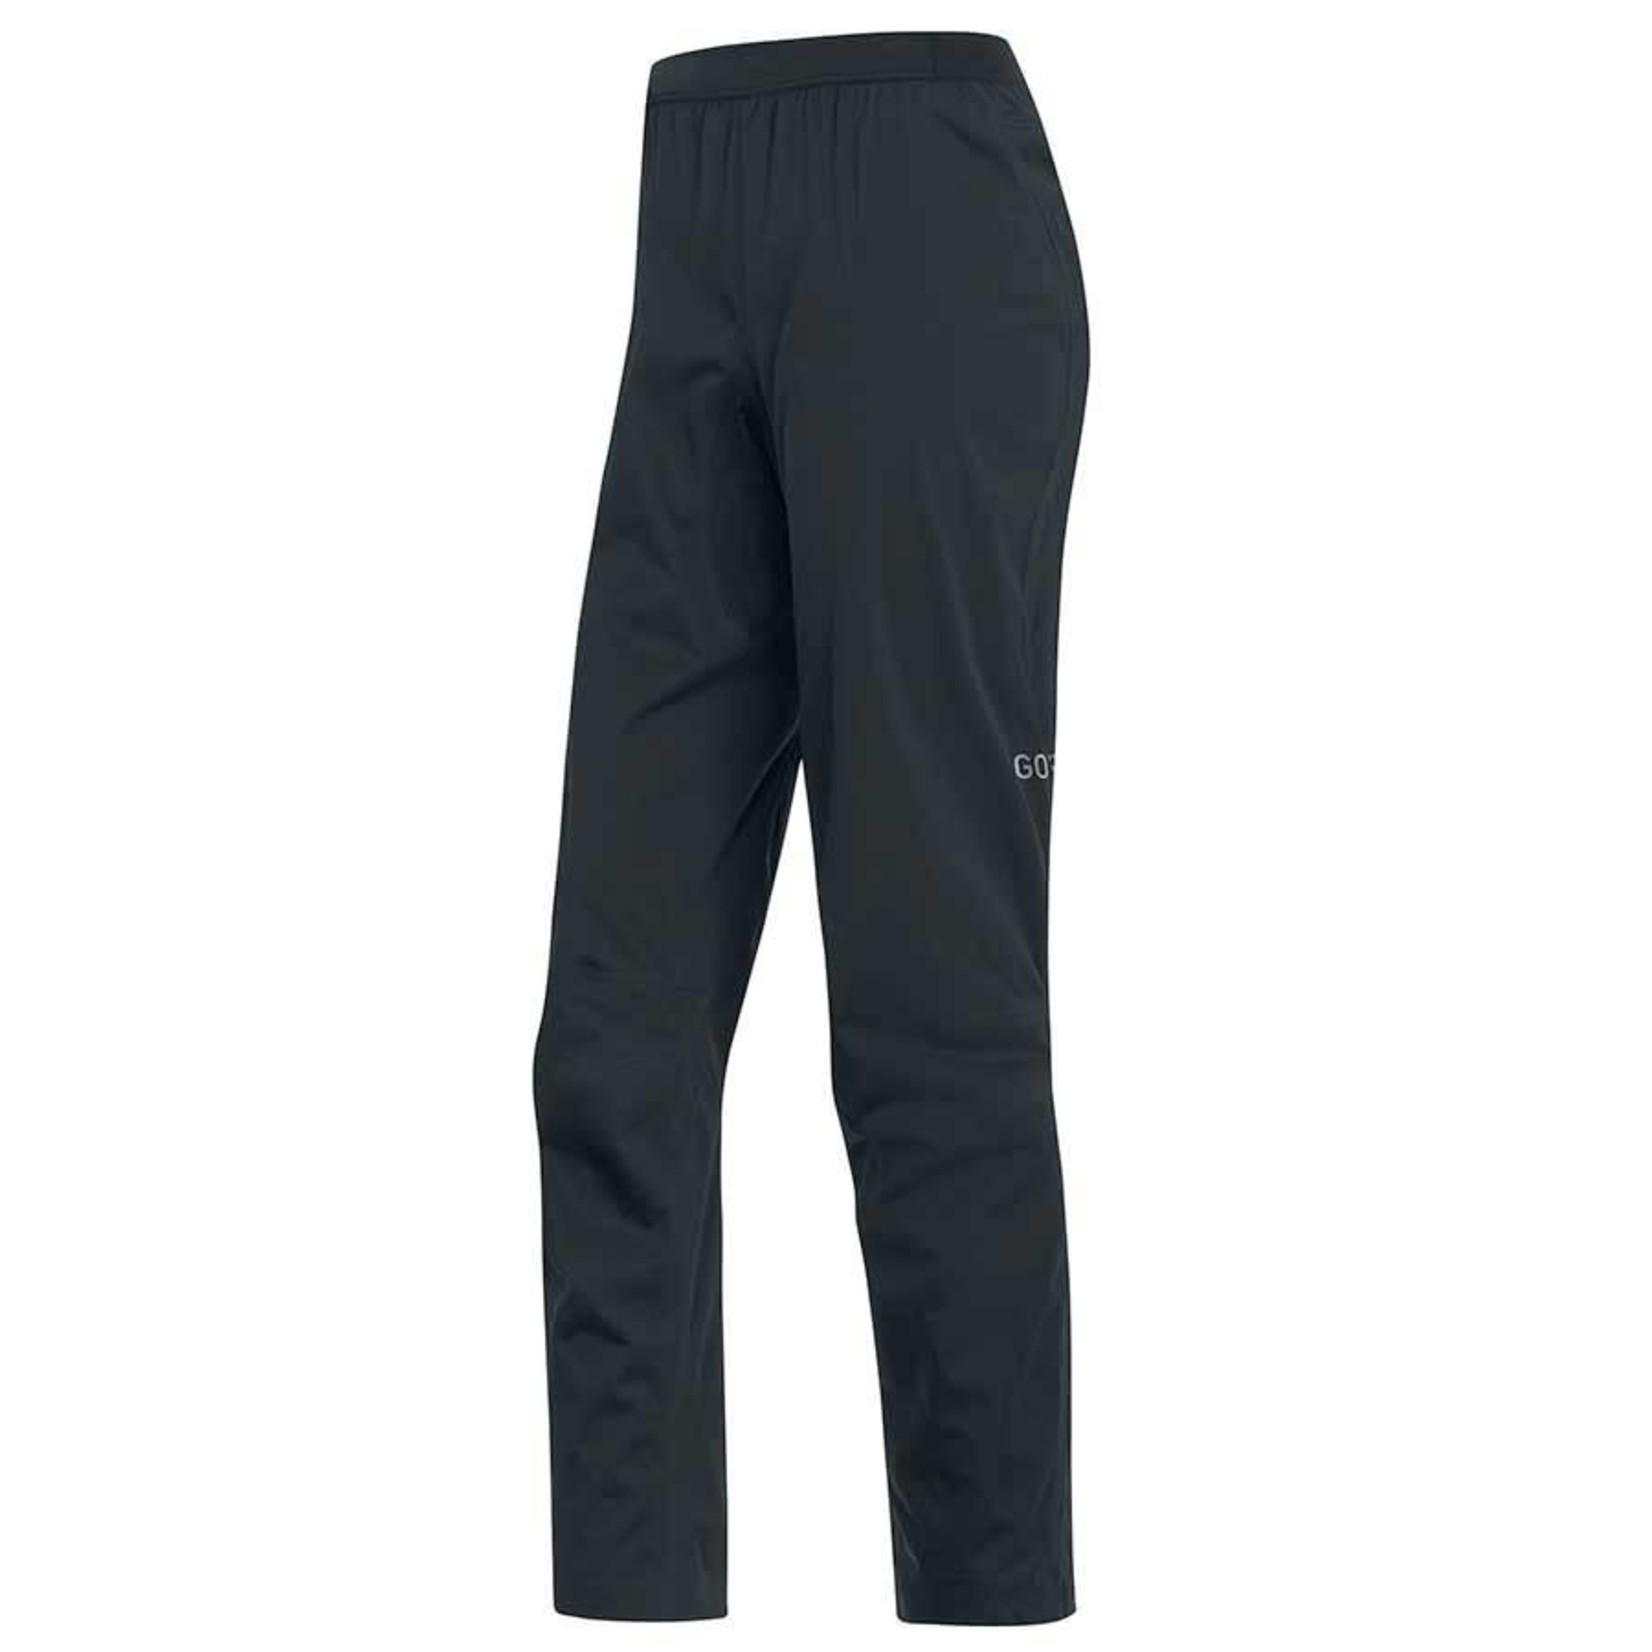 Gore Wear Gore Wear Women's C5 Active Trail Rain Pants